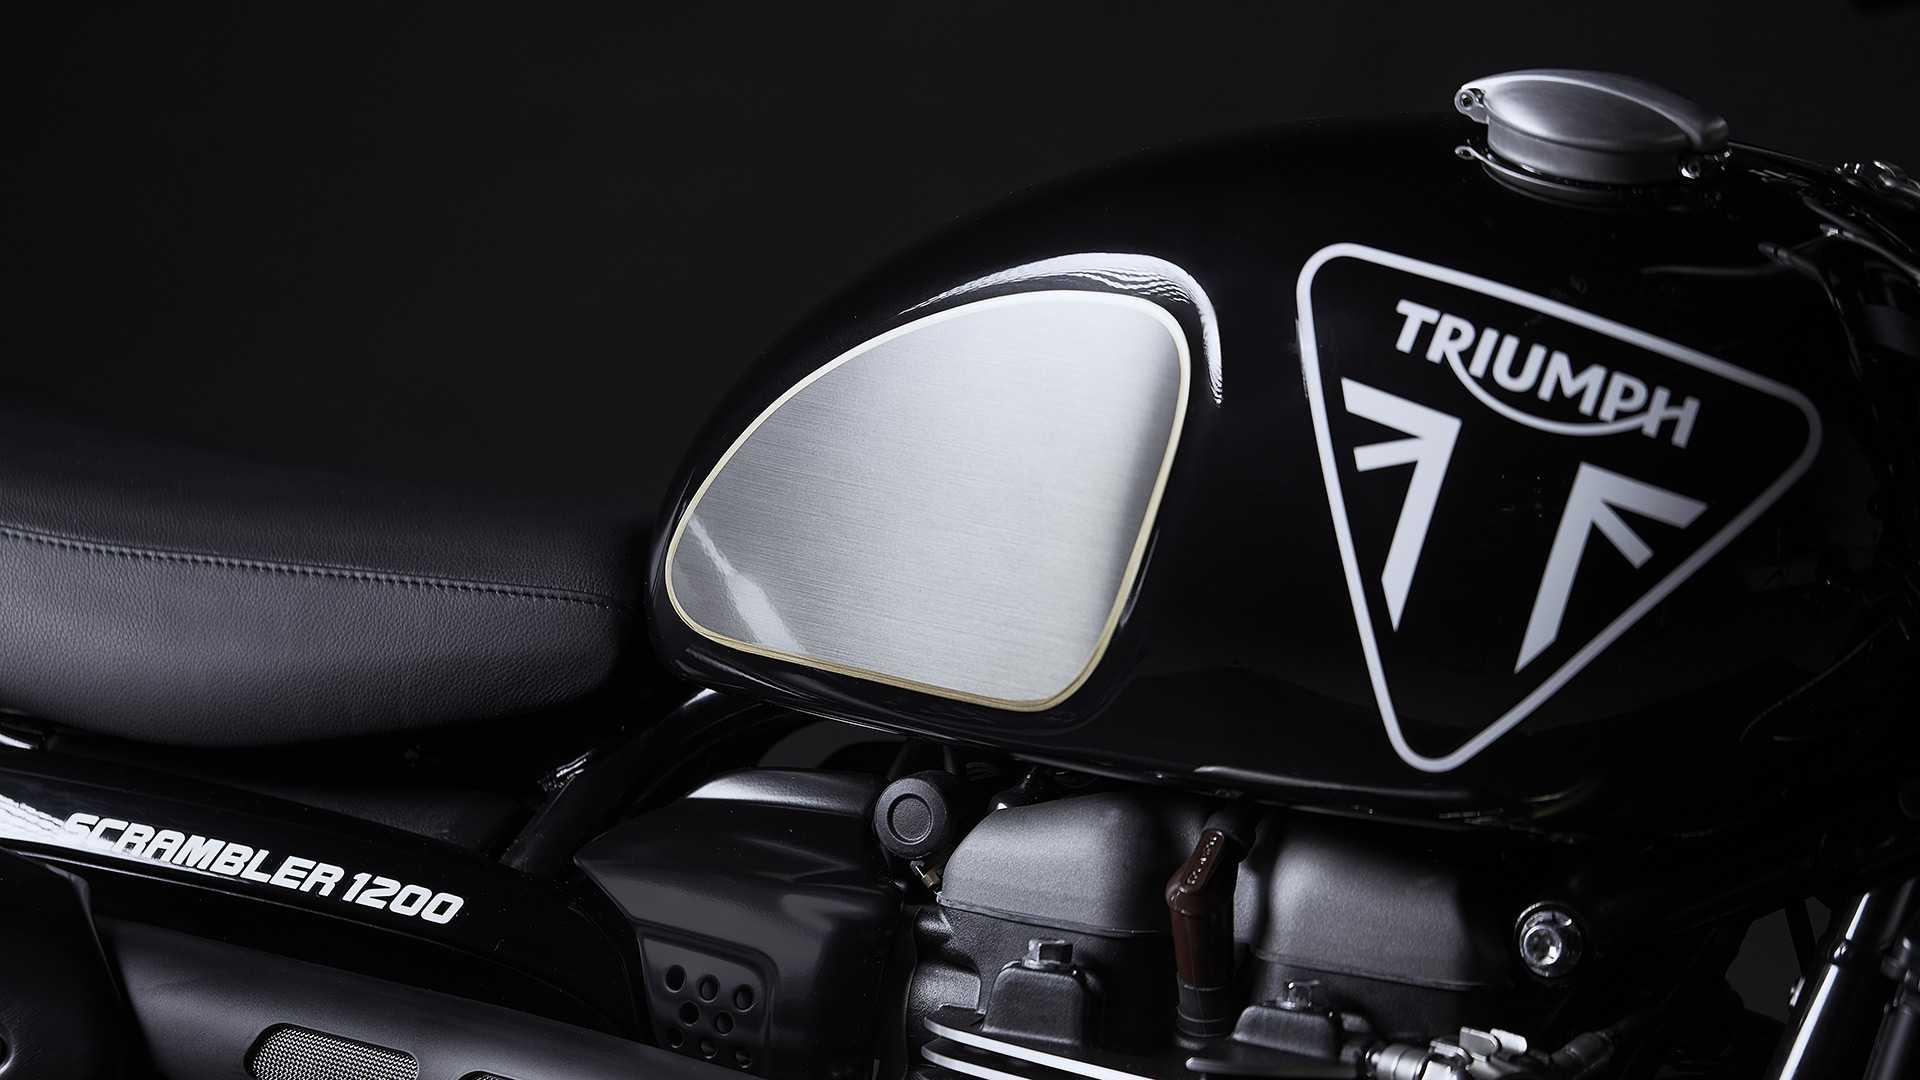 2020 Triumph Scrambler 1200 Bond Edition gas tank